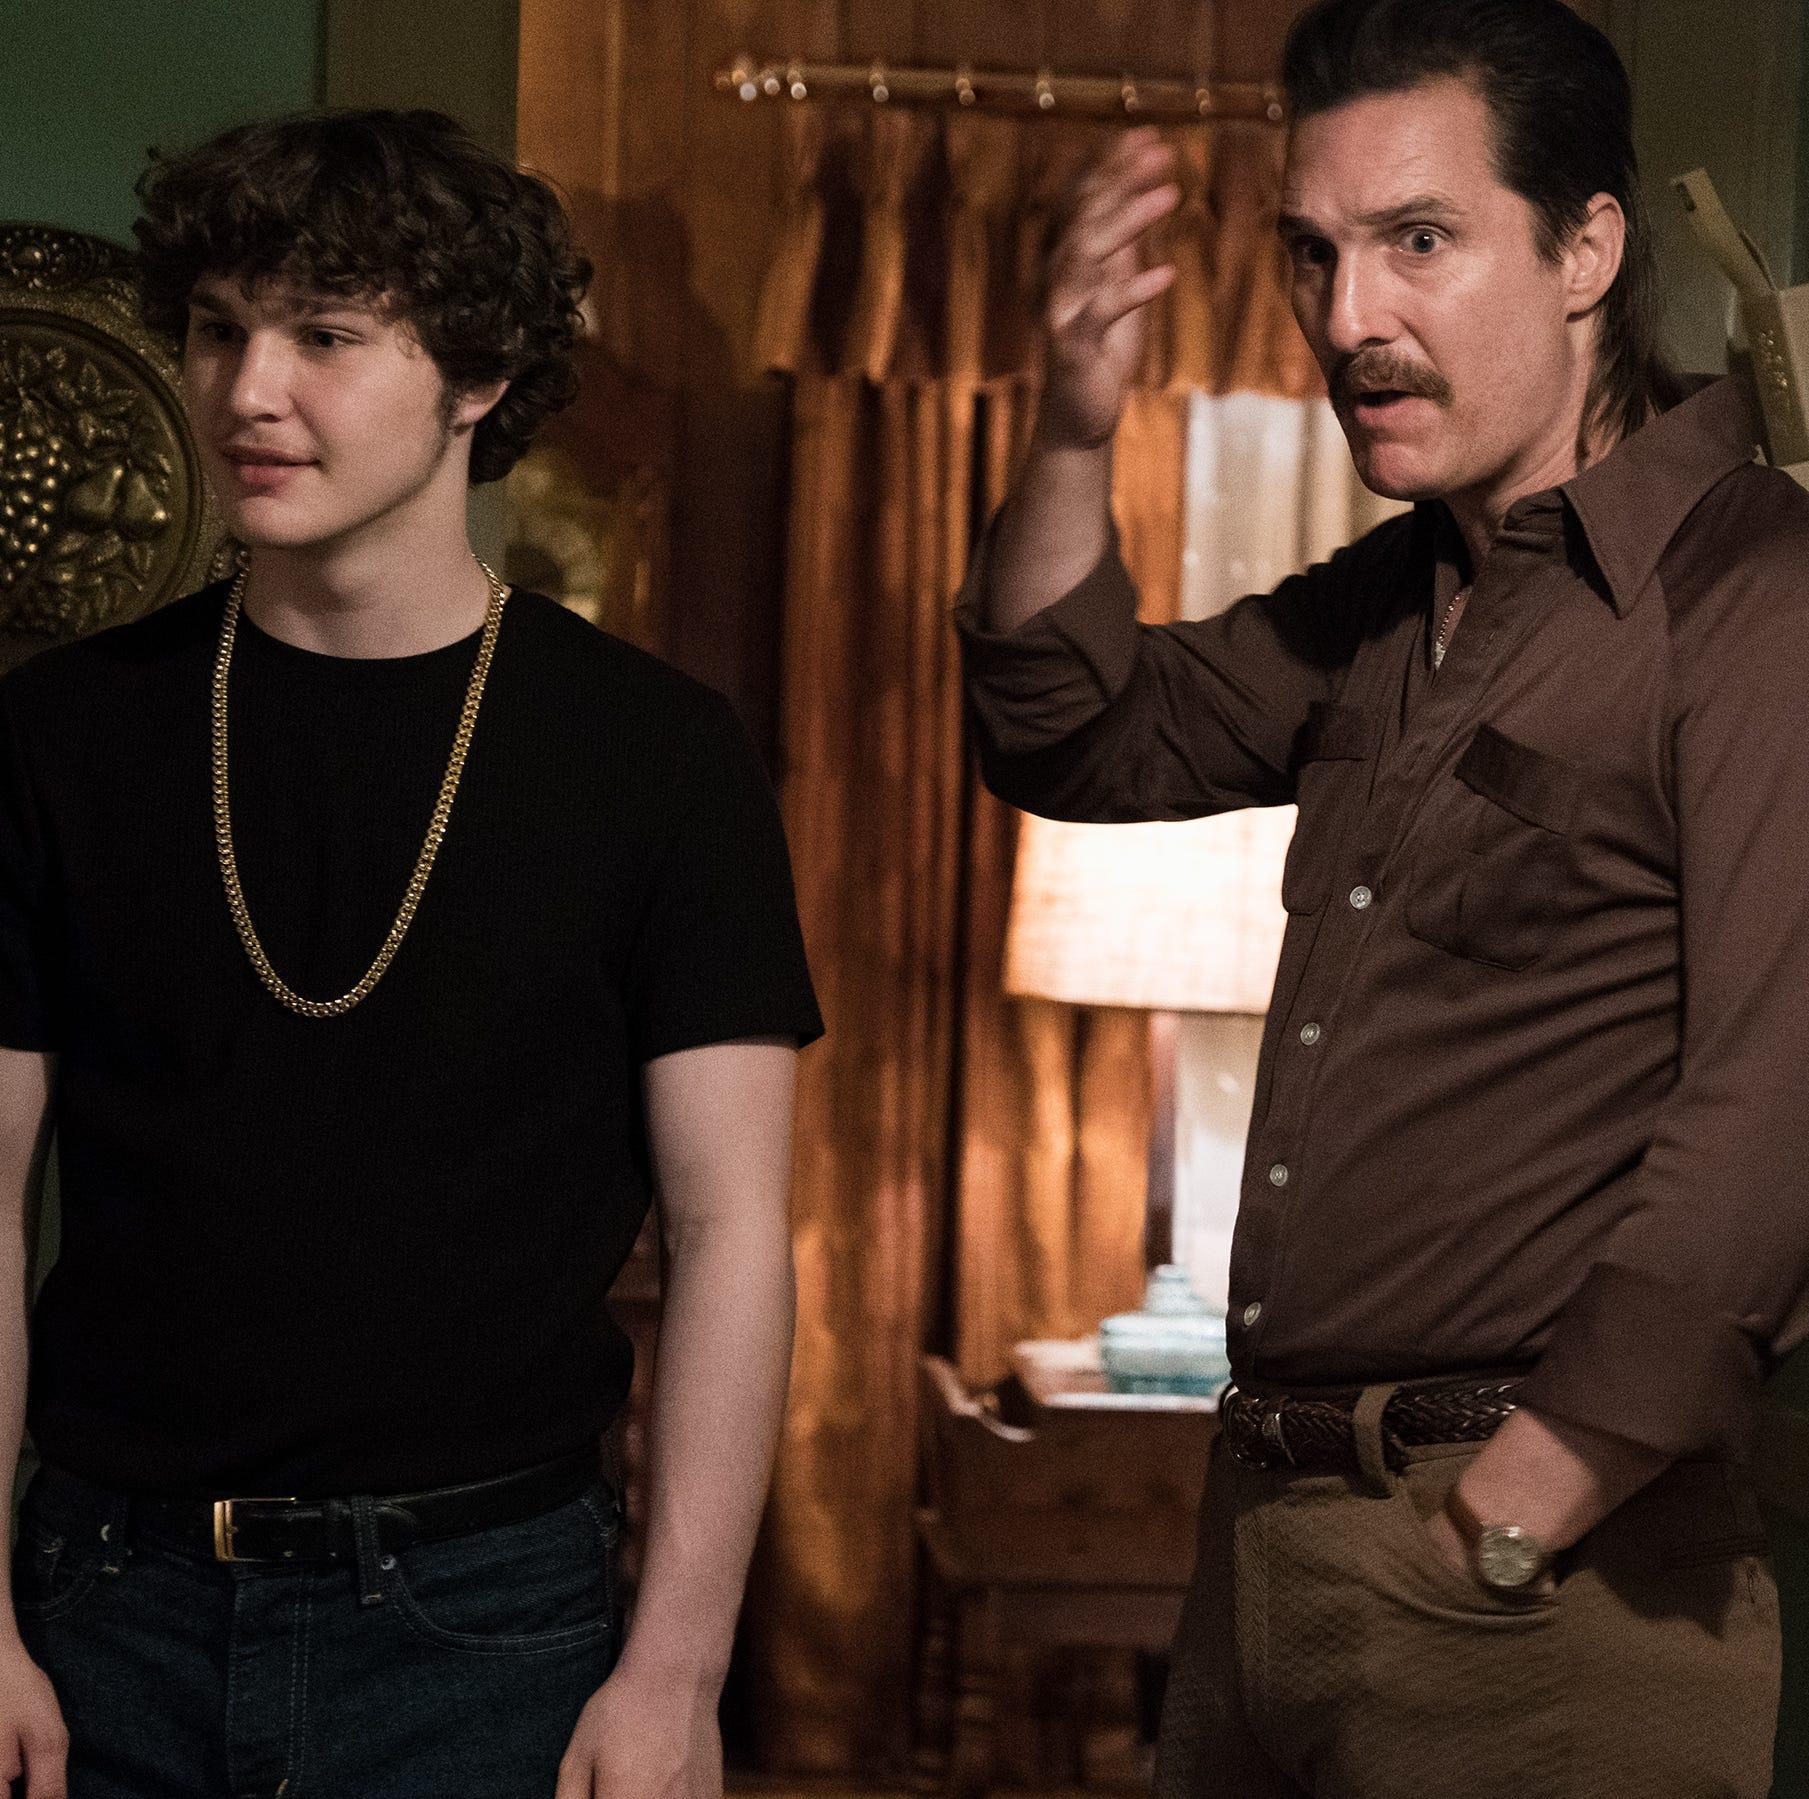 'White Boy Rick' draws mixed reviews, praise for acting